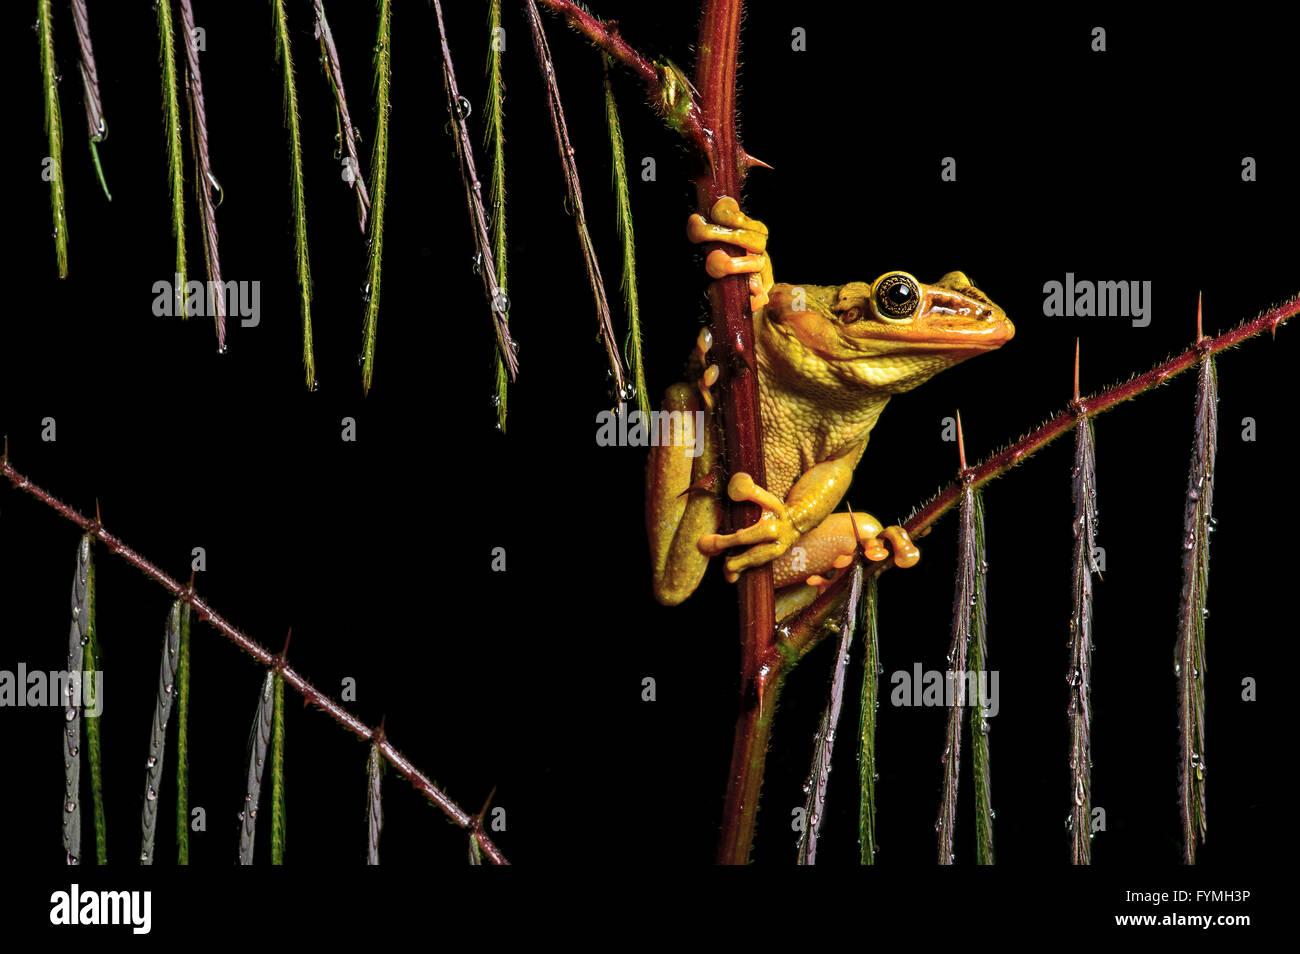 Male of neotropical Jordan's casque-headed tree frog (Trachycephalus jordani), Jorupe Biological Reserve, Ecuador - Stock Image